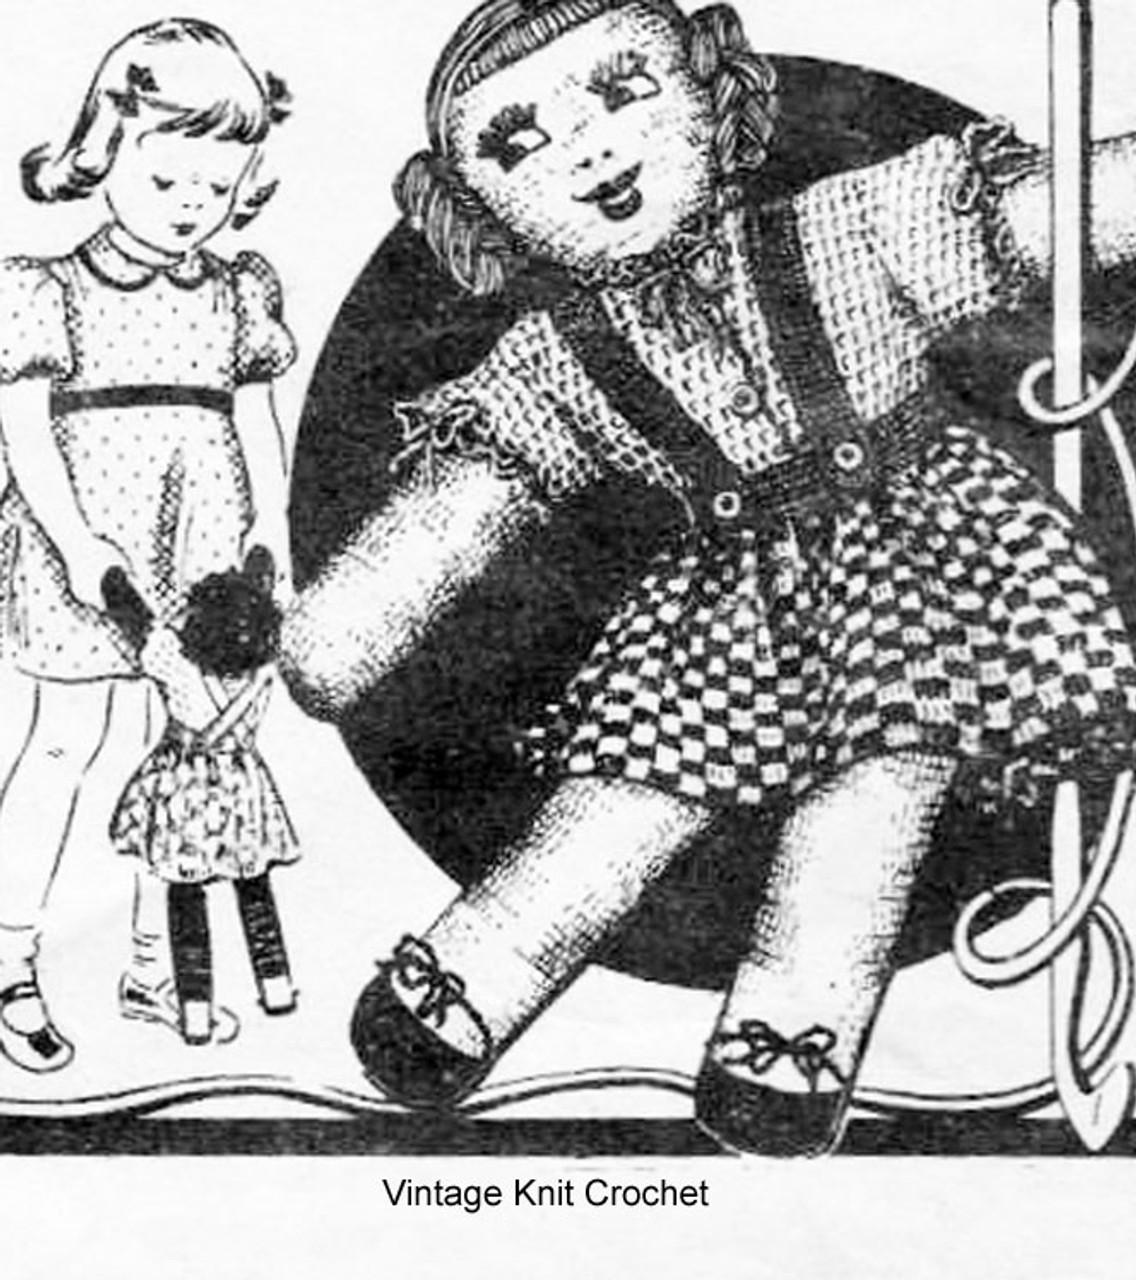 Vintage 1930s Crochet Doll Pattern, Laura Wheeler 1873